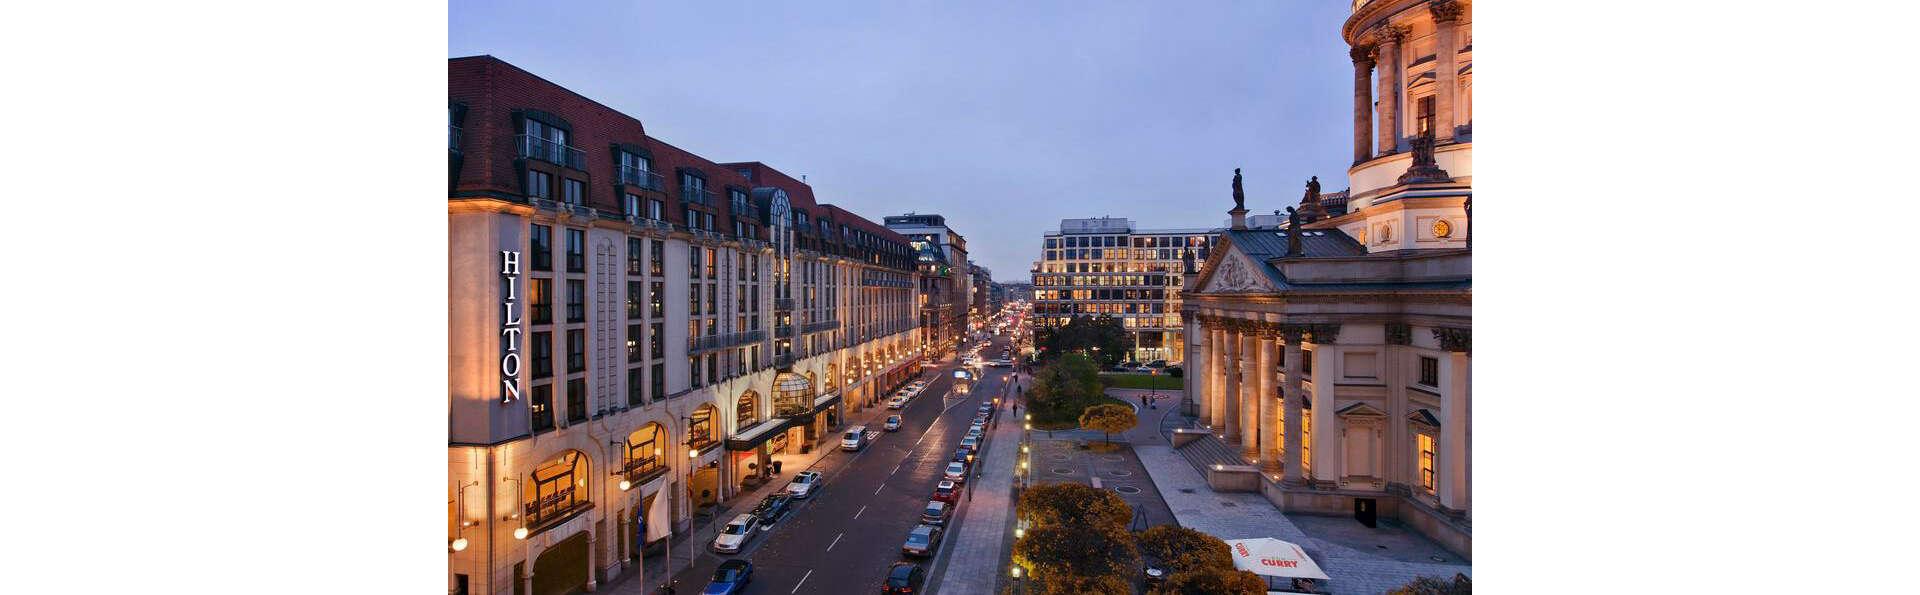 Hilton Berlin - EDIT_VIEW_01.jpg